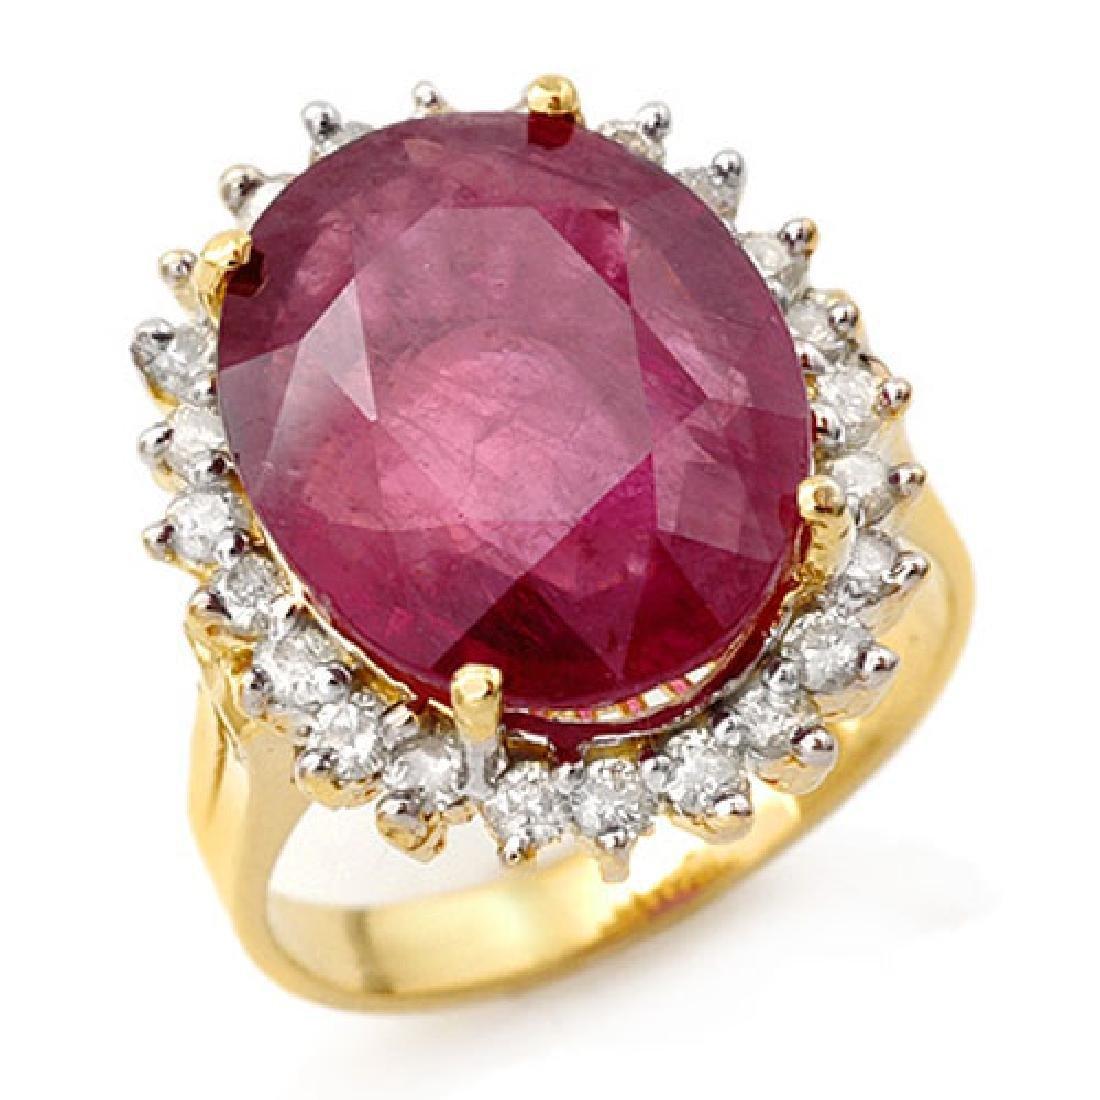 12.0 CTW Ruby & Diamond Ring 14K Yellow Gold